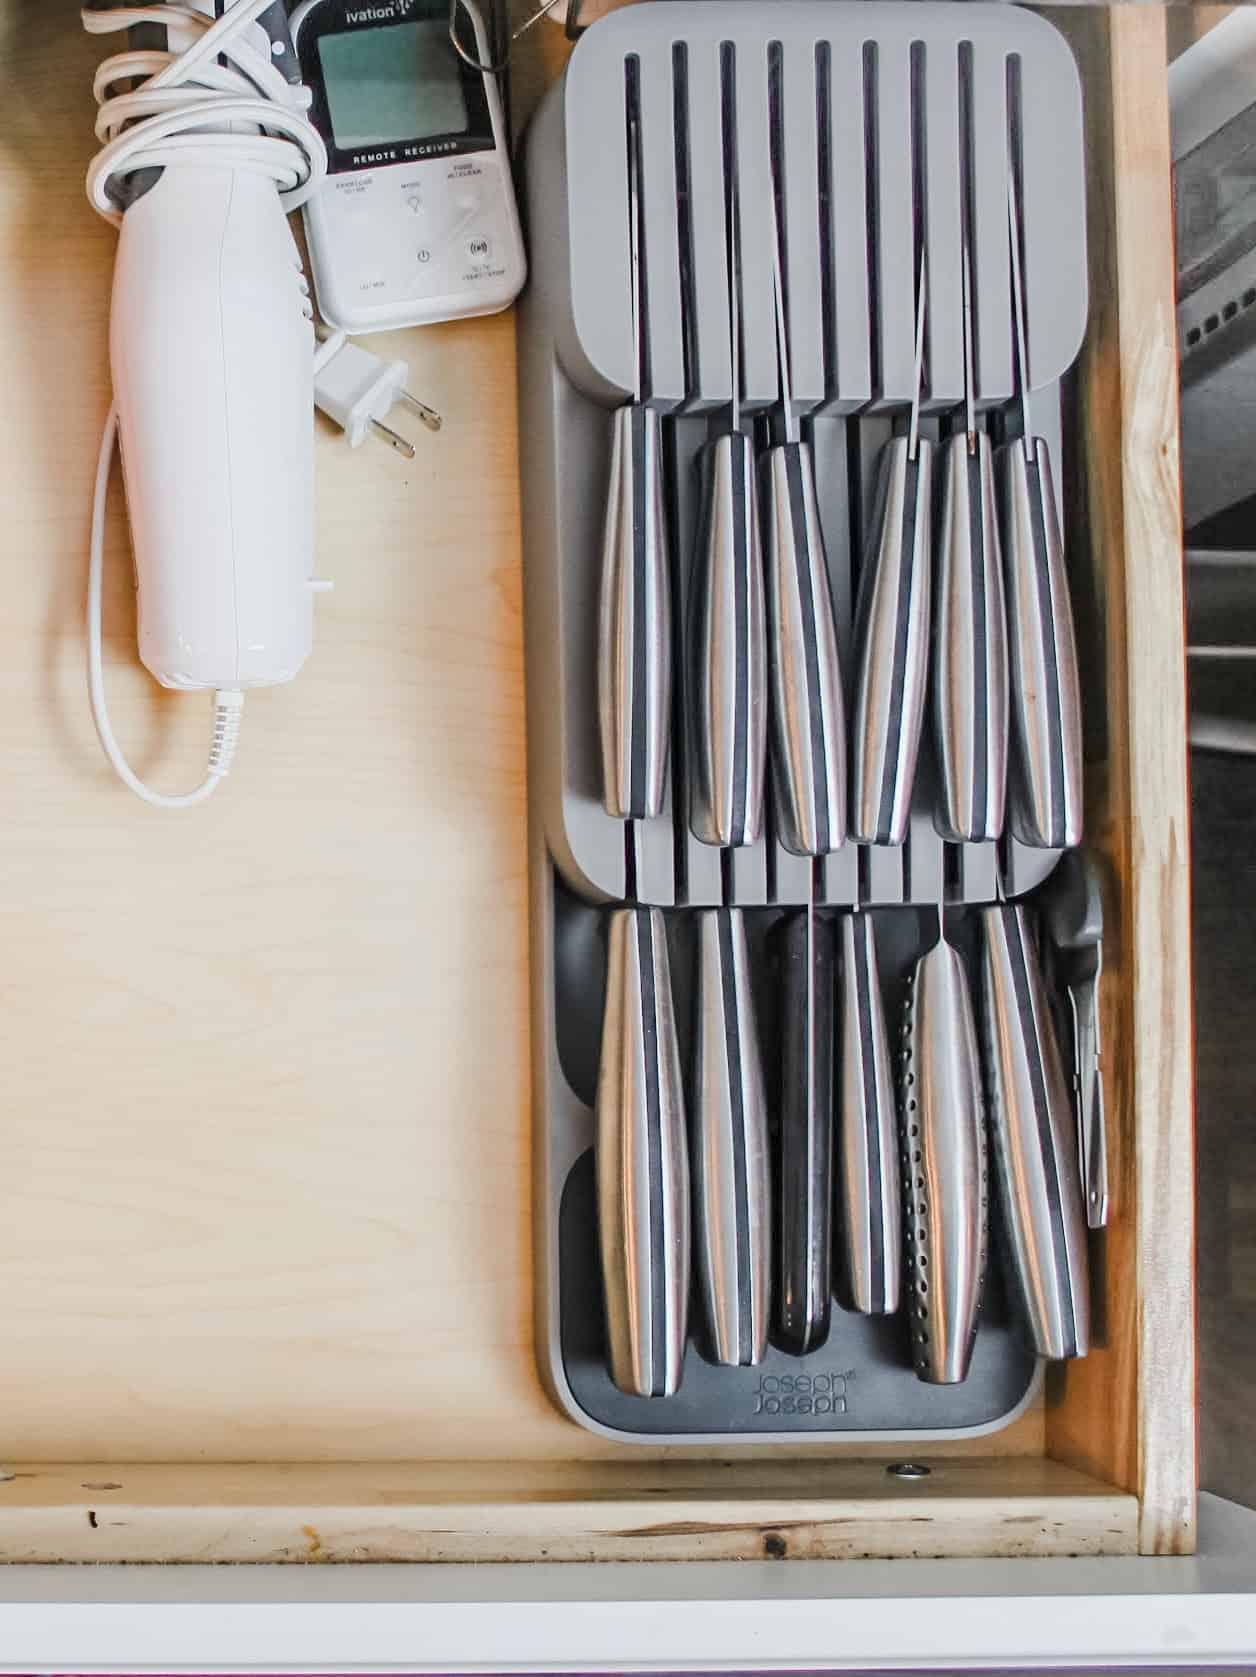 Knife Organizer Kitchen Organizer for less than $20